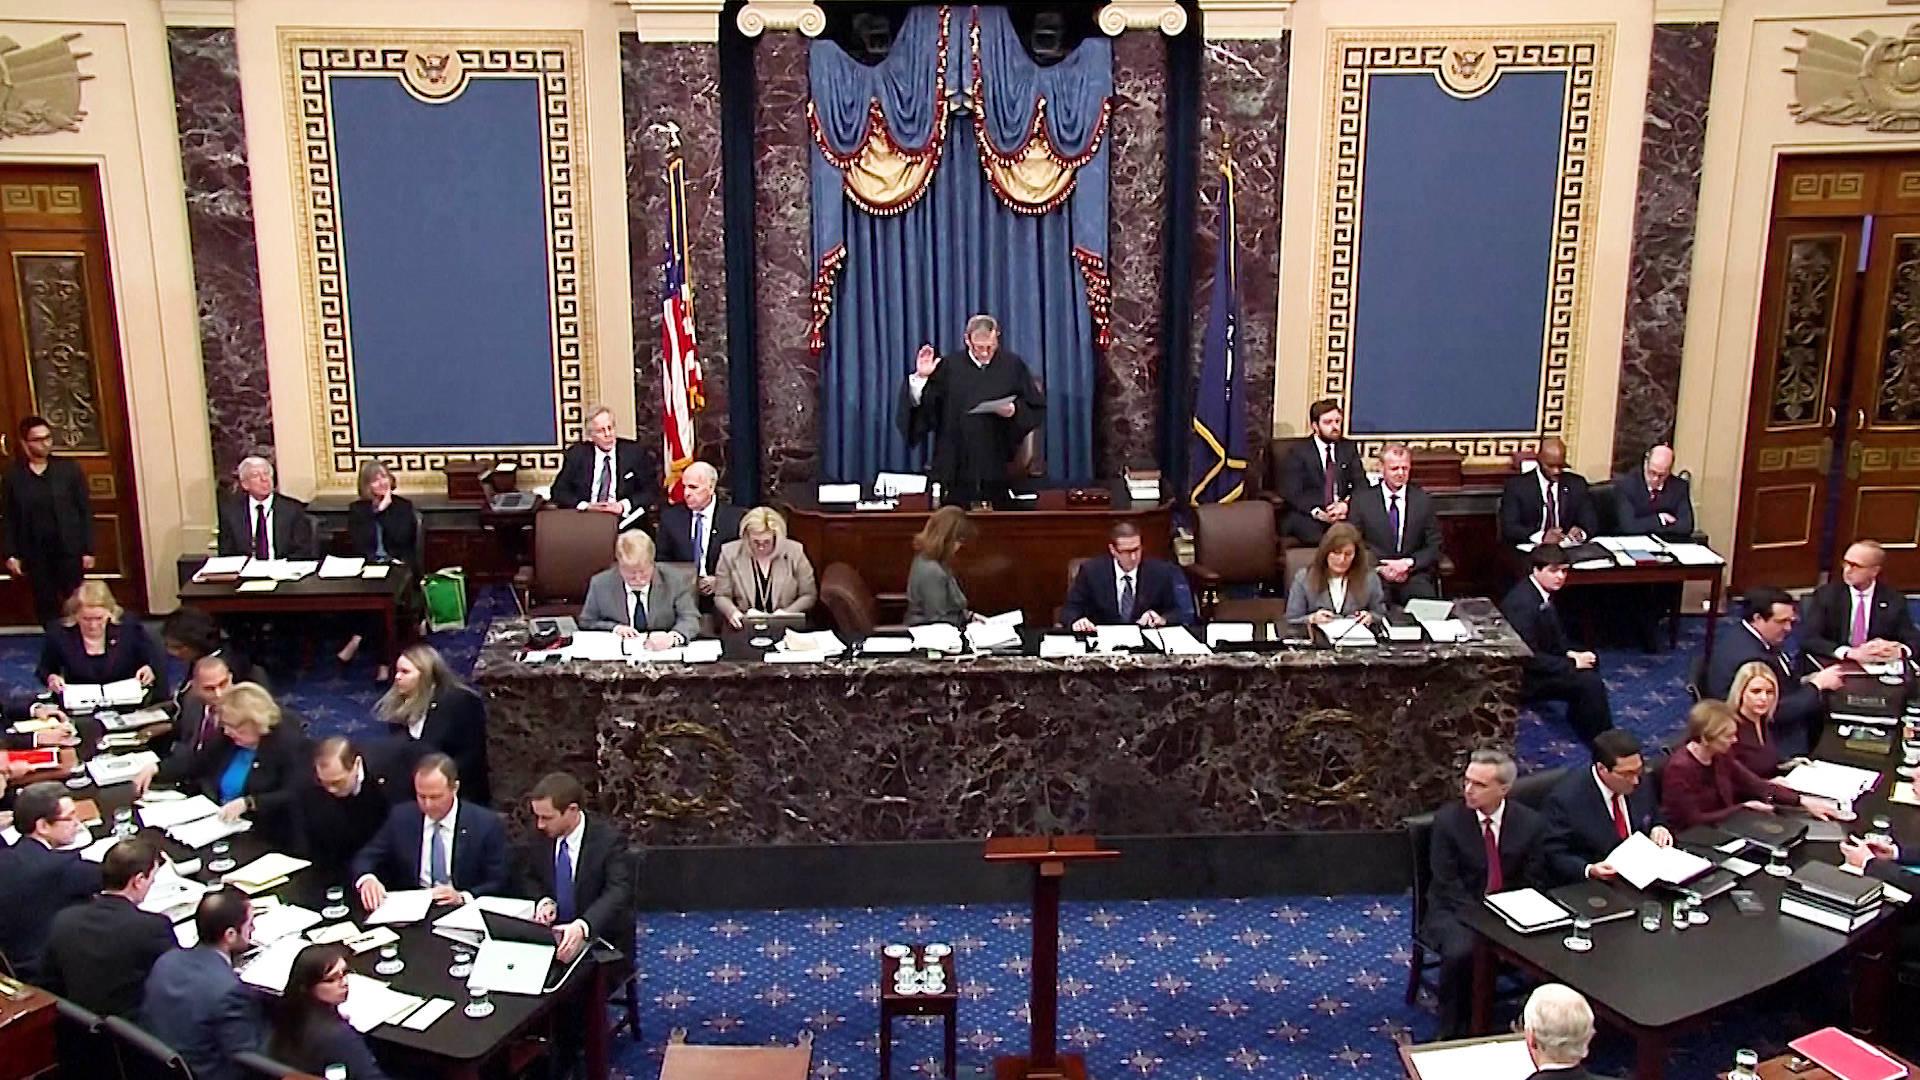 H1 us senate approves rules trump impeachment trial jerry nadler adam schiff ukraine biden